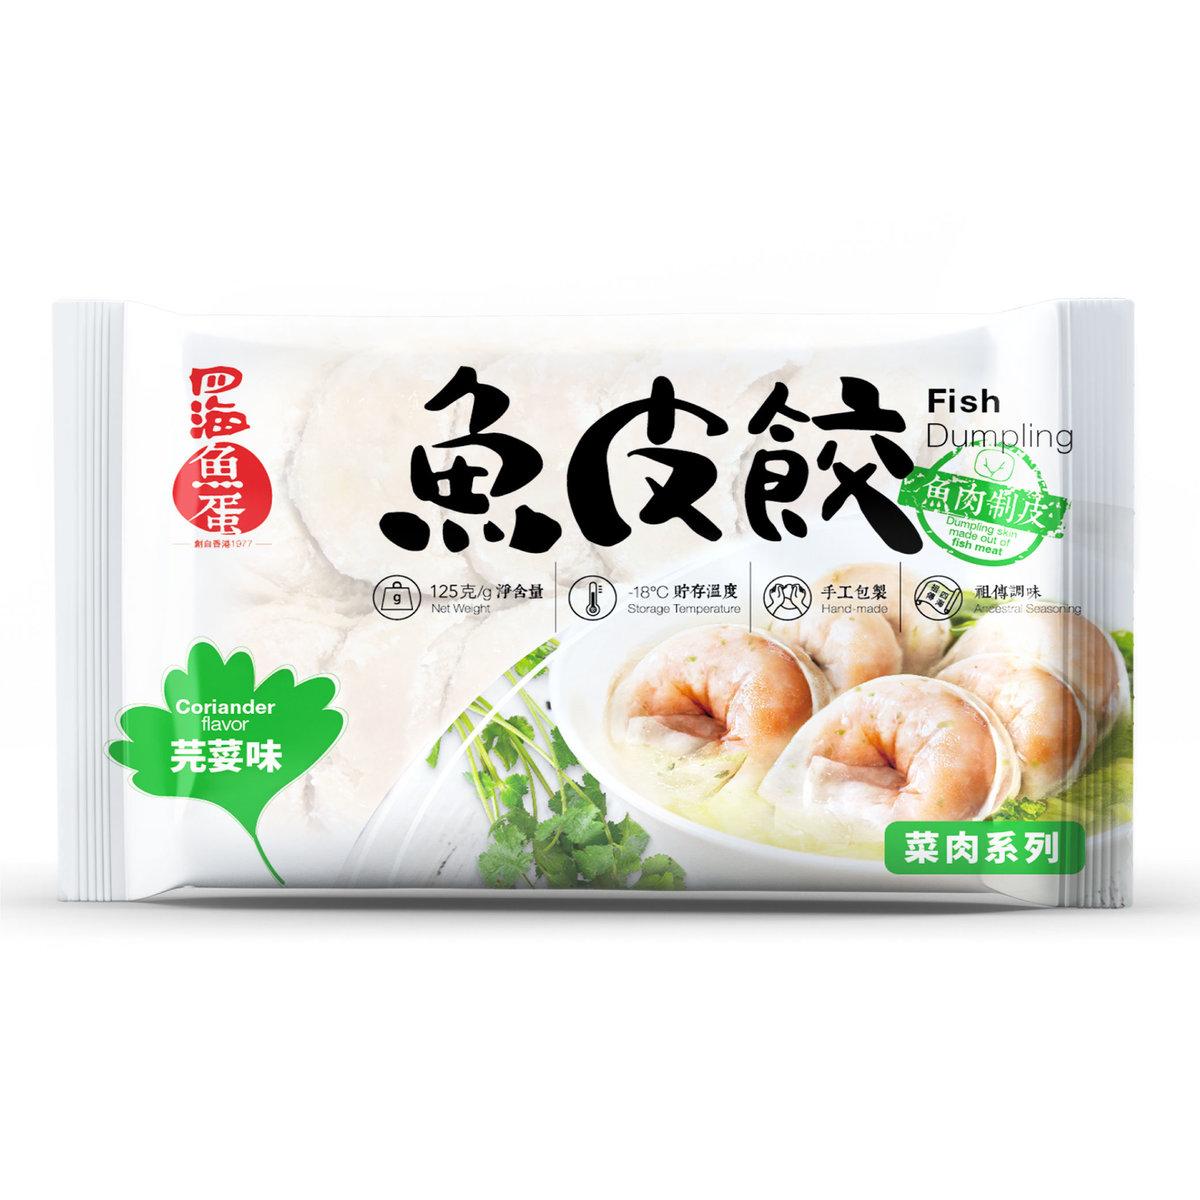 Coriander Flavour Fish Dumpling 125g (FROZEN)